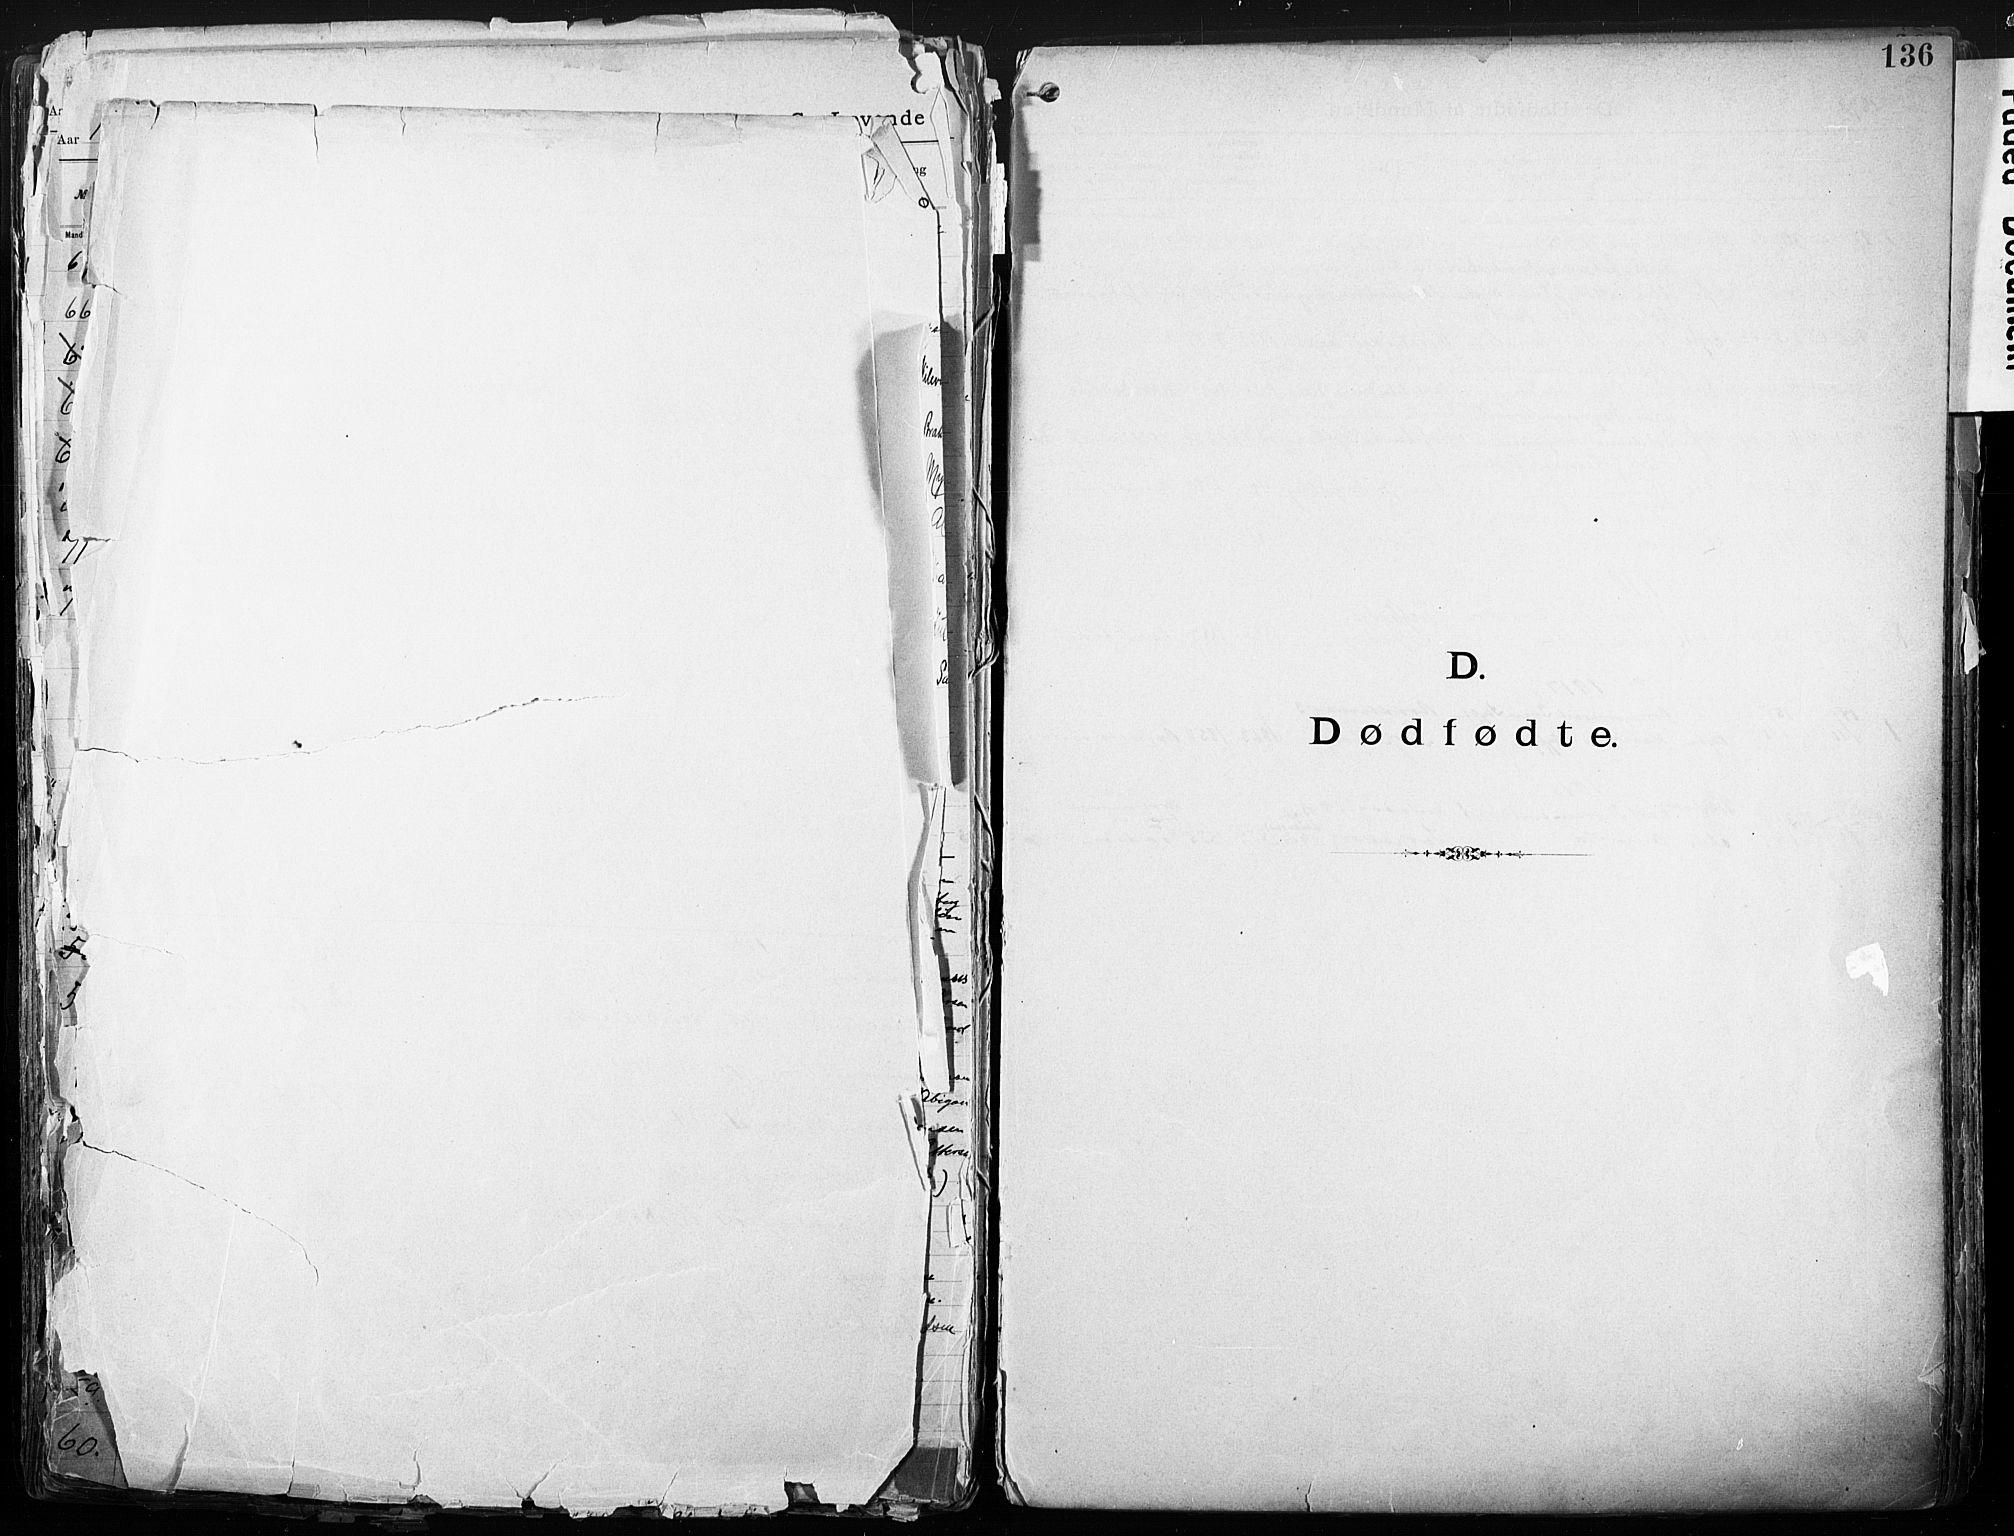 SAO, Sarpsborg metodistkirke, A/L0004: Dissenter register no. 4, 1892-1923, p. 136